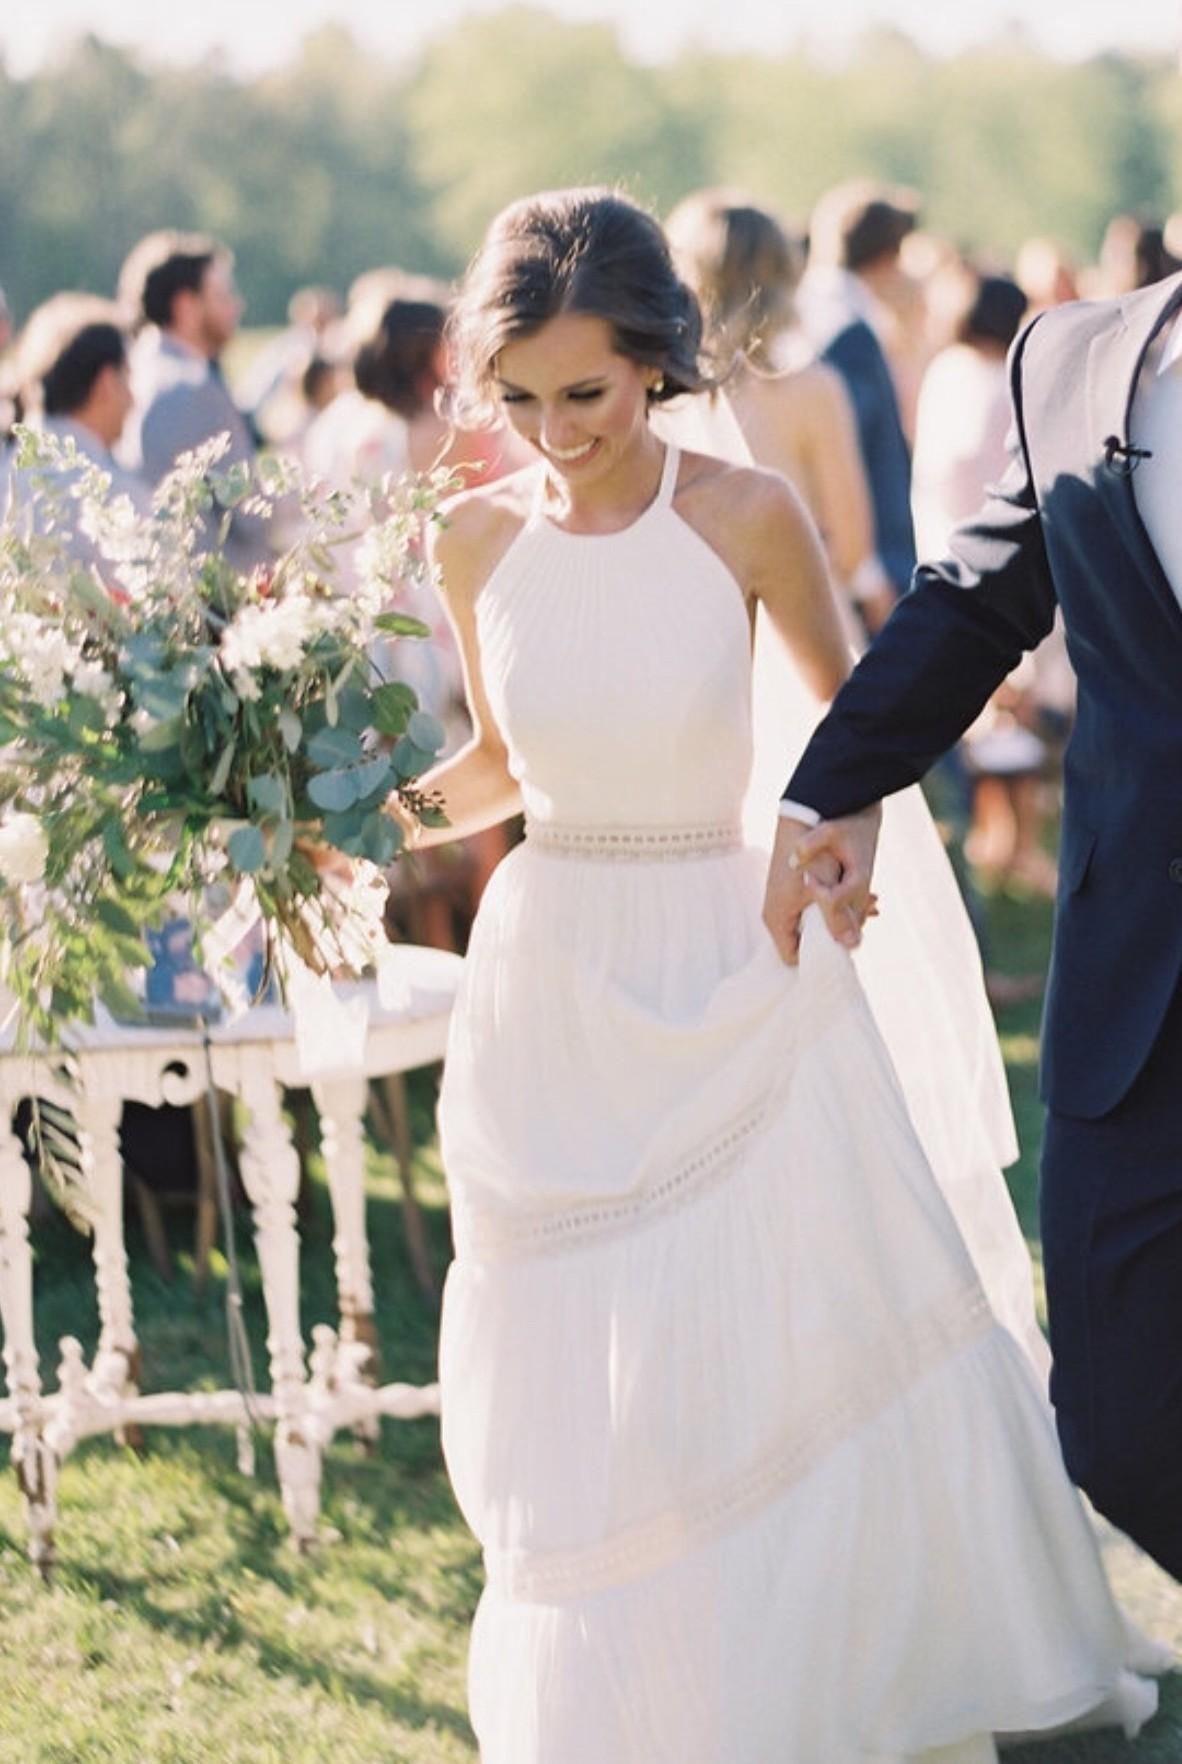 ef21c5e7c49 Heidi Elnora Cameron Darling New Wedding Dress on Sale 60% Off - Stillwhite